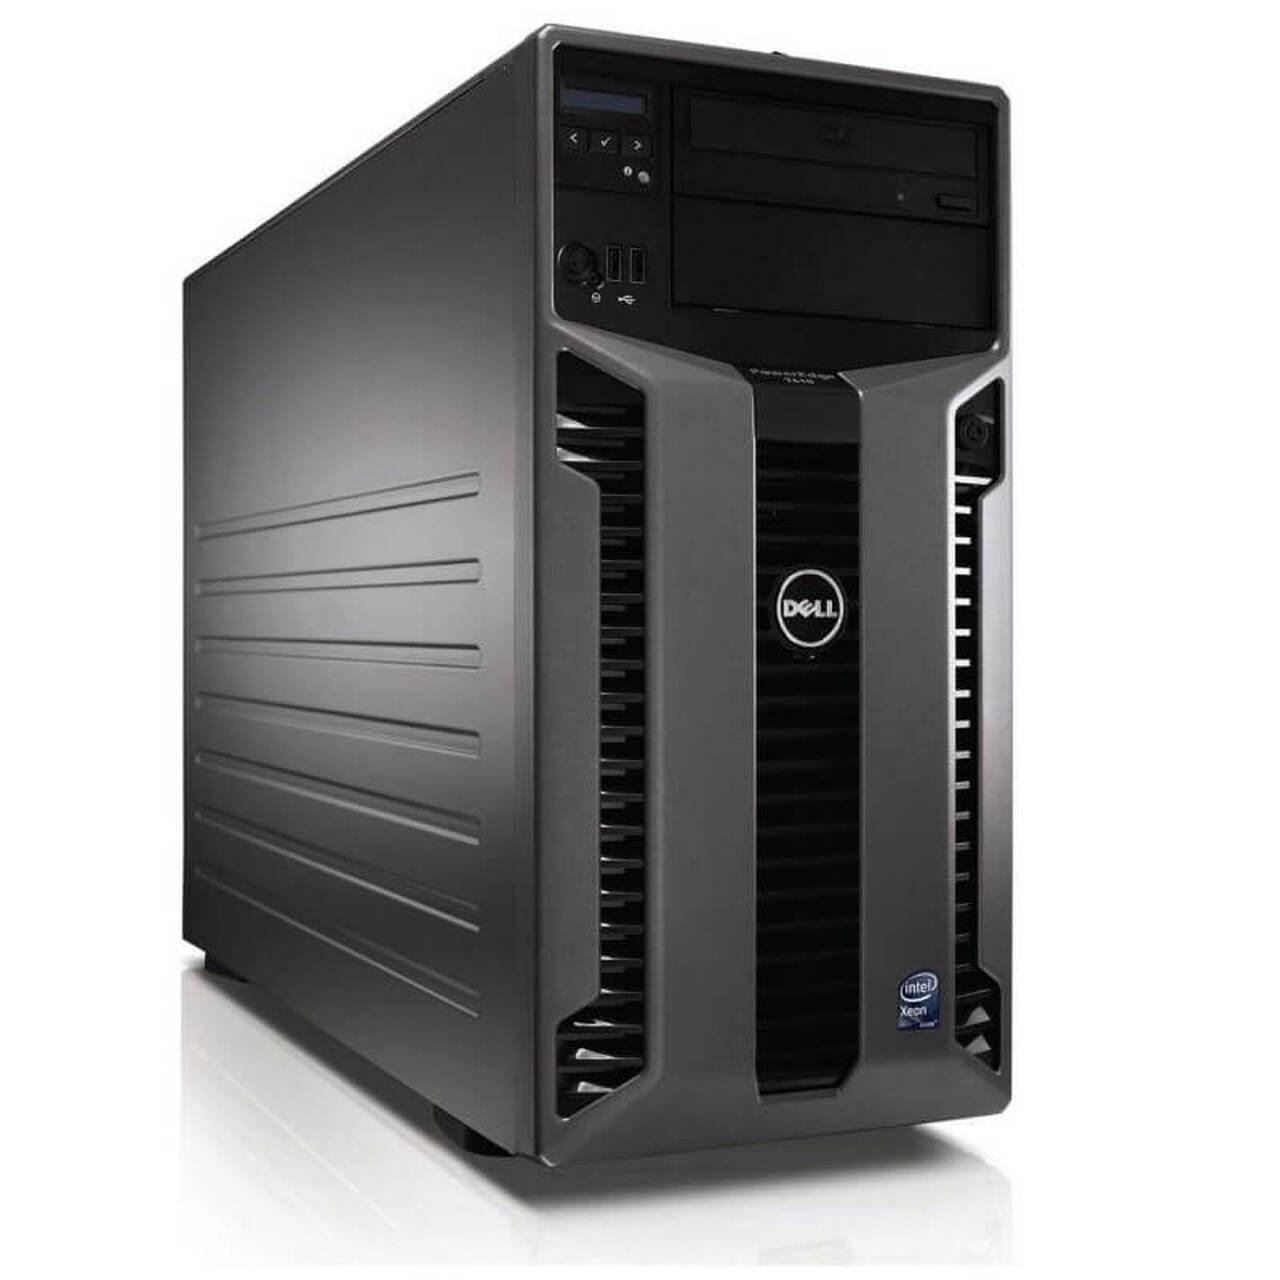 servidor dell t610 com 2 xeon six core 32gb intel e-5645 2.4ghz 2hds sas 600gb